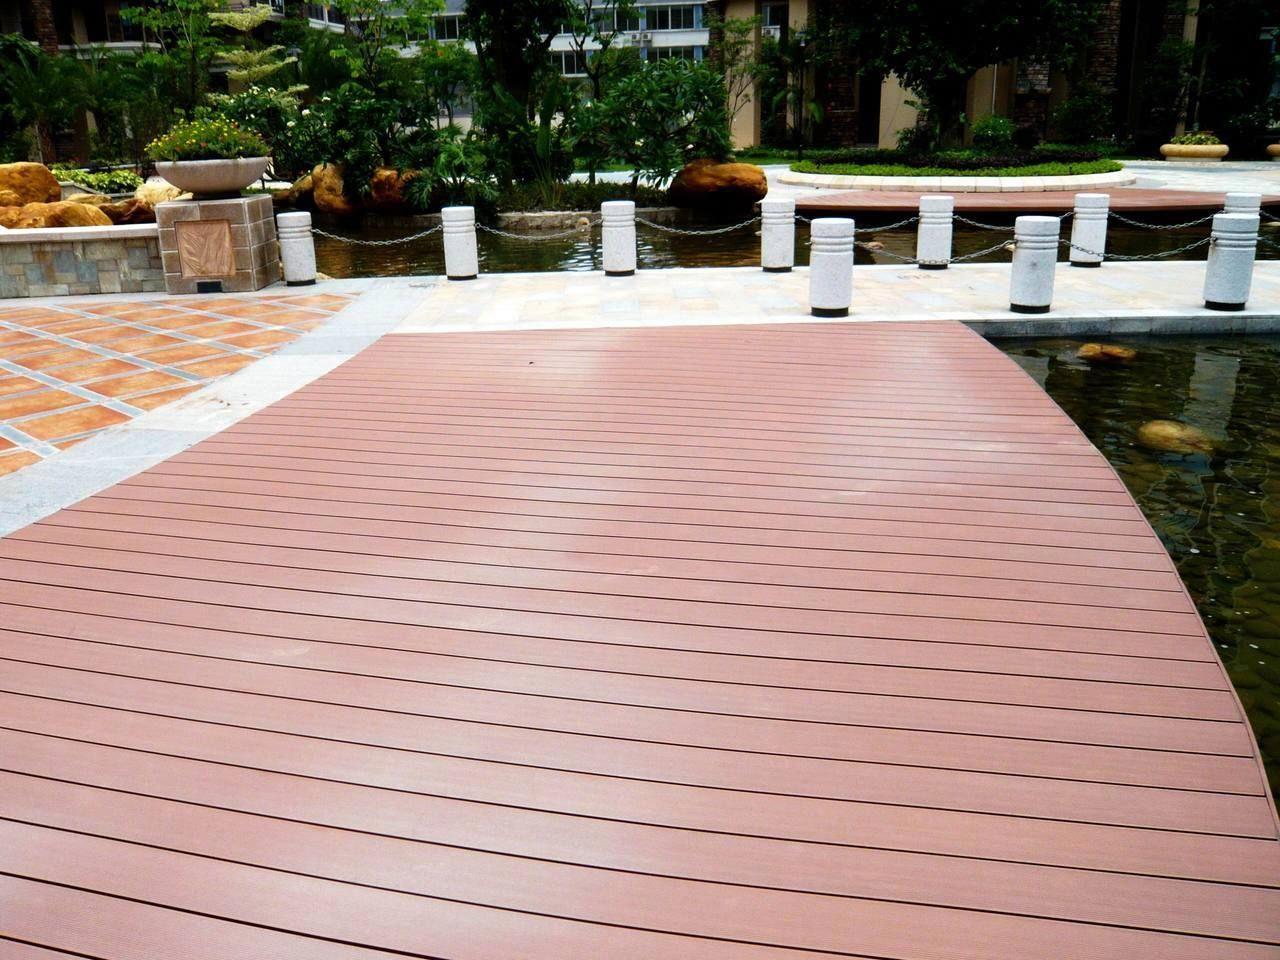 Truly Waterproff Flooring 20 Foot Cedar Deck Boards Plastic Decking Very Slippery Building A Deck Deck Diy Deck